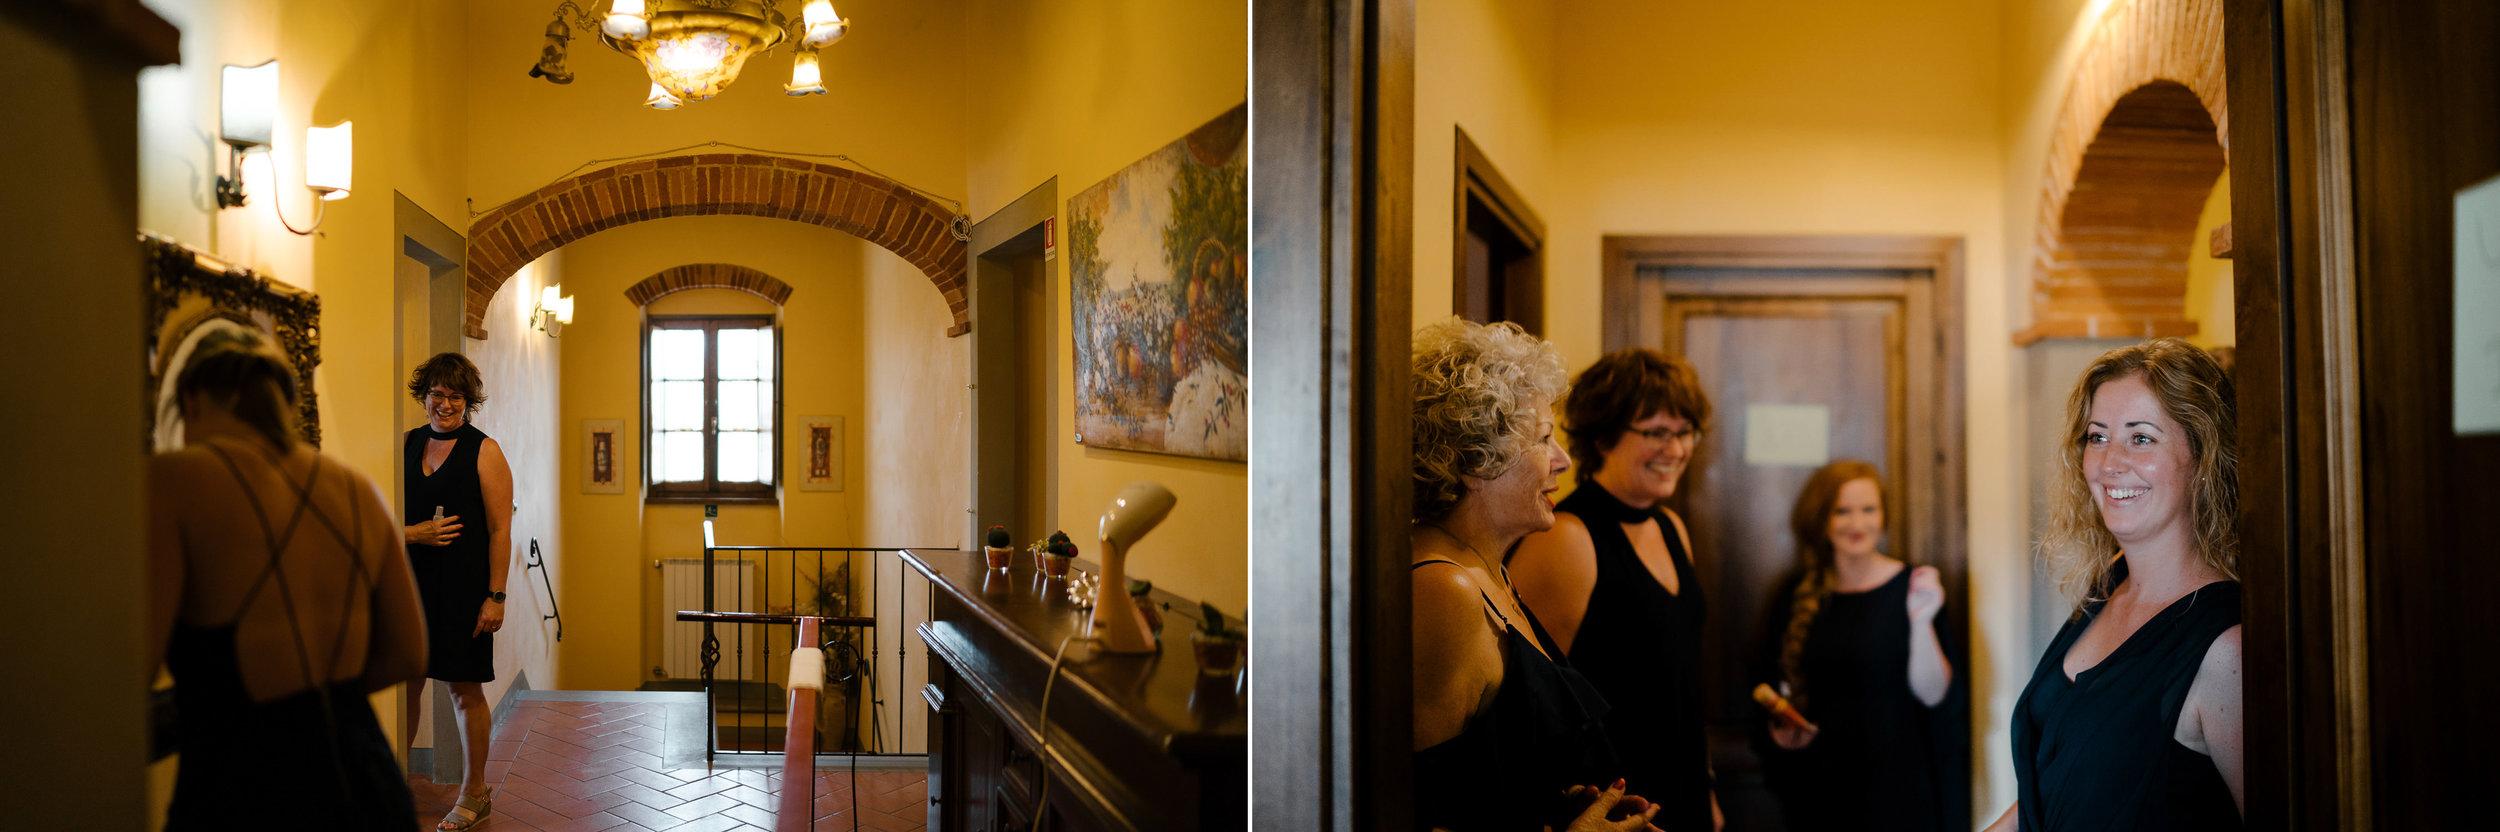 Destination wedding photographer mark hadden tuscany